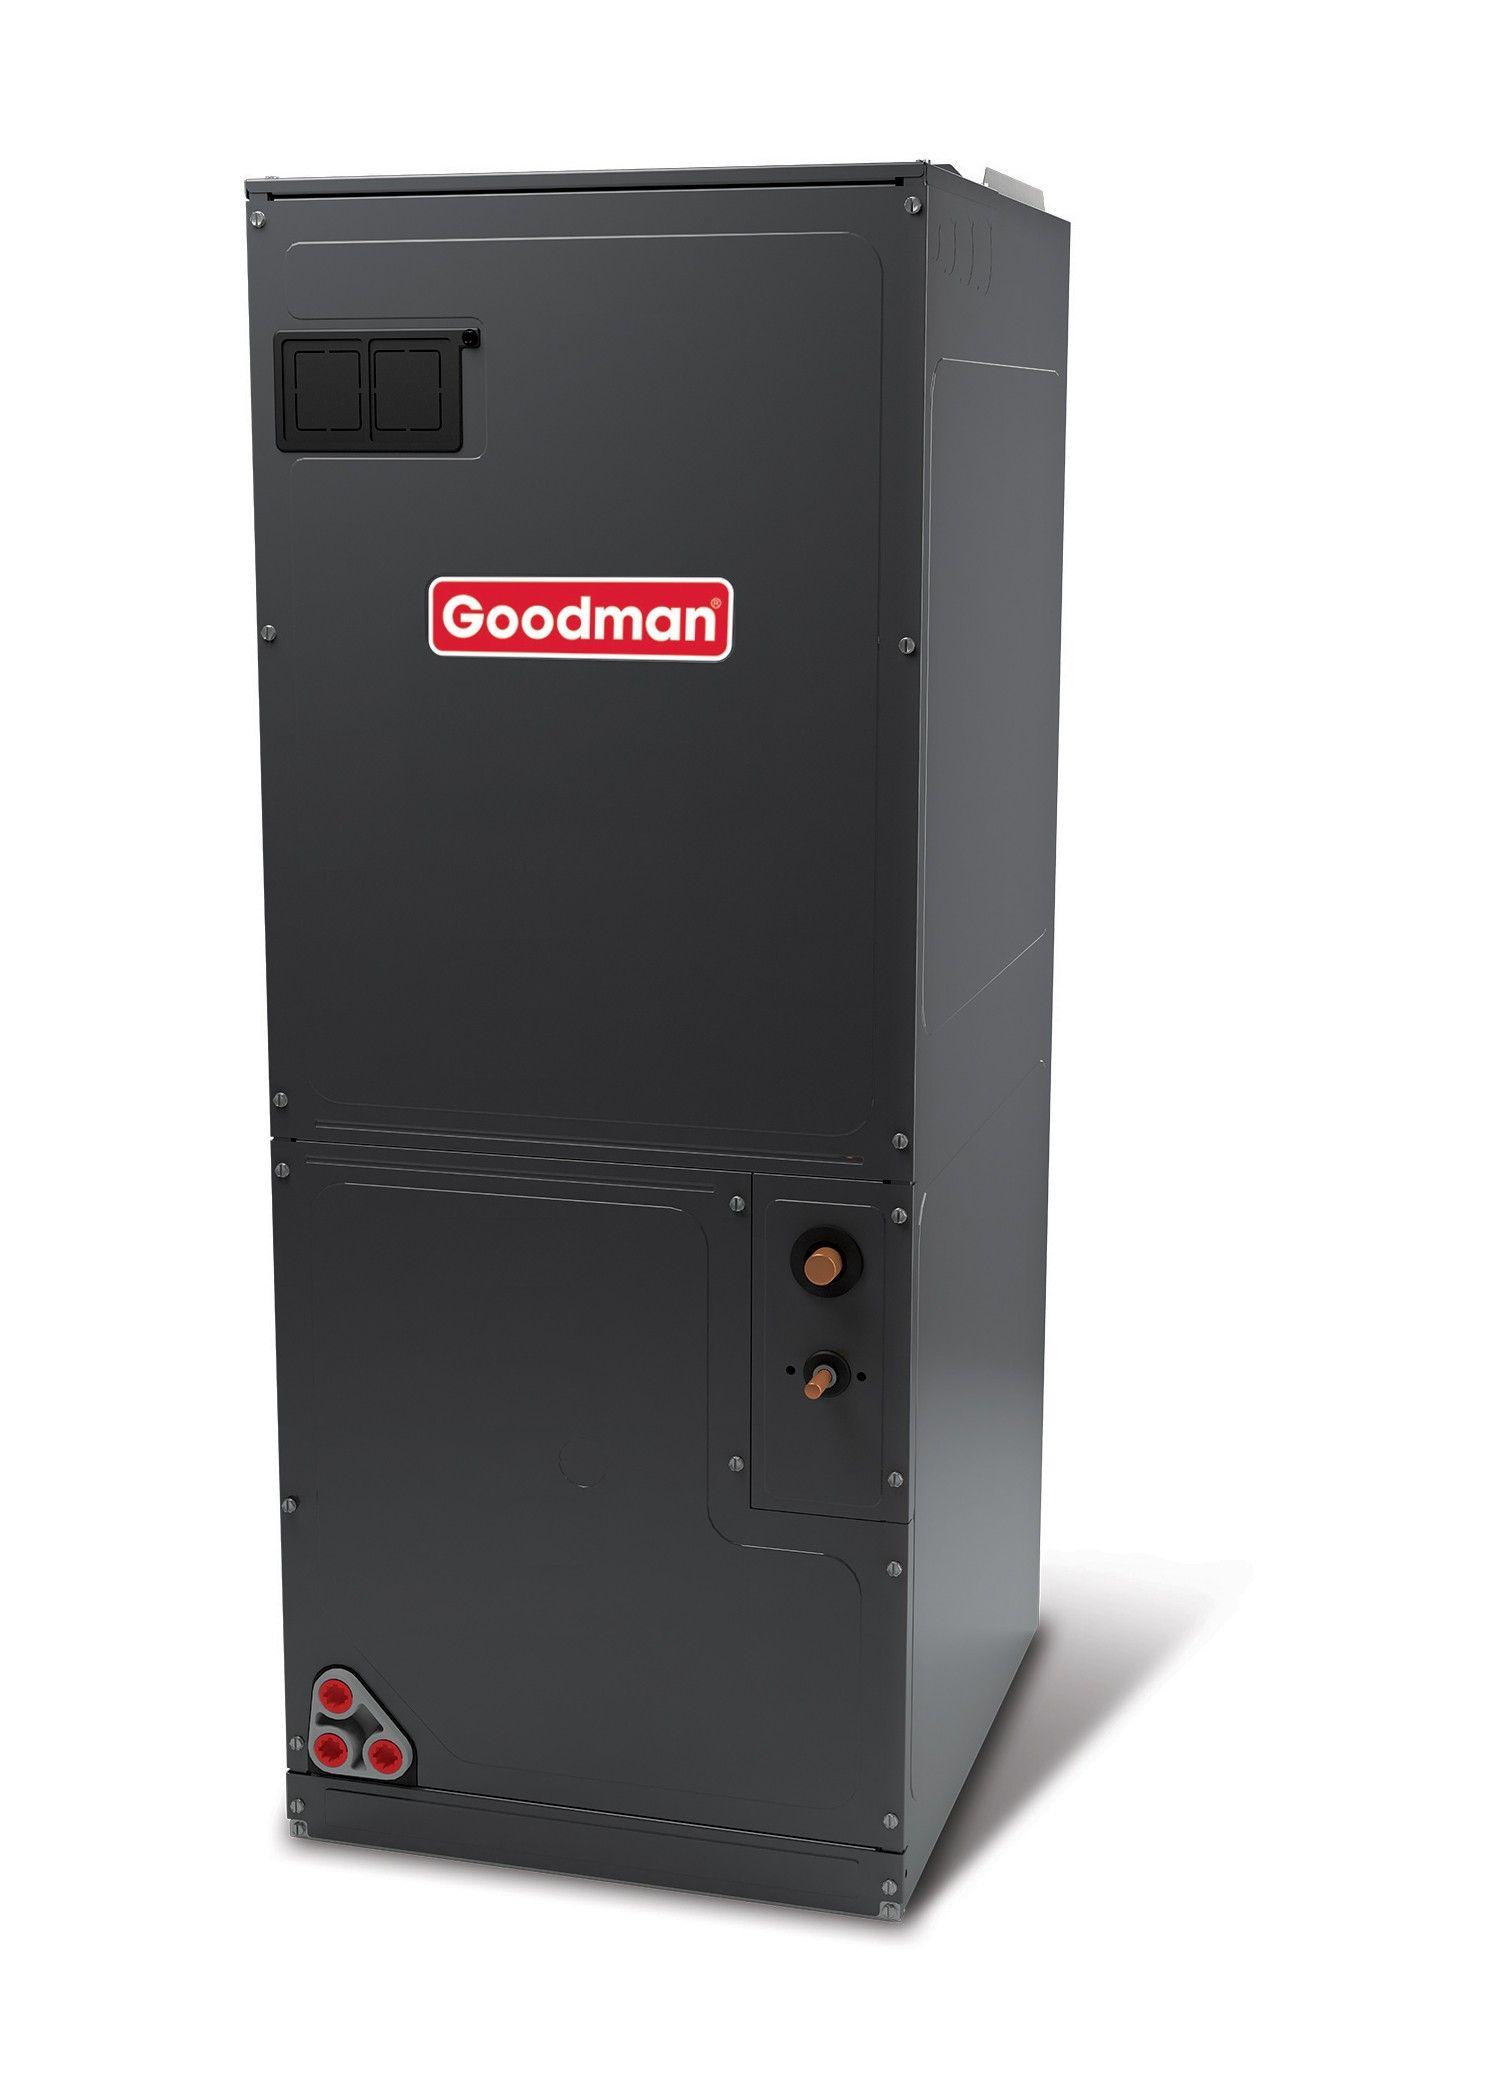 Goodman 2.0 Ton ASPT High Efficiency Multi-position Air Handler